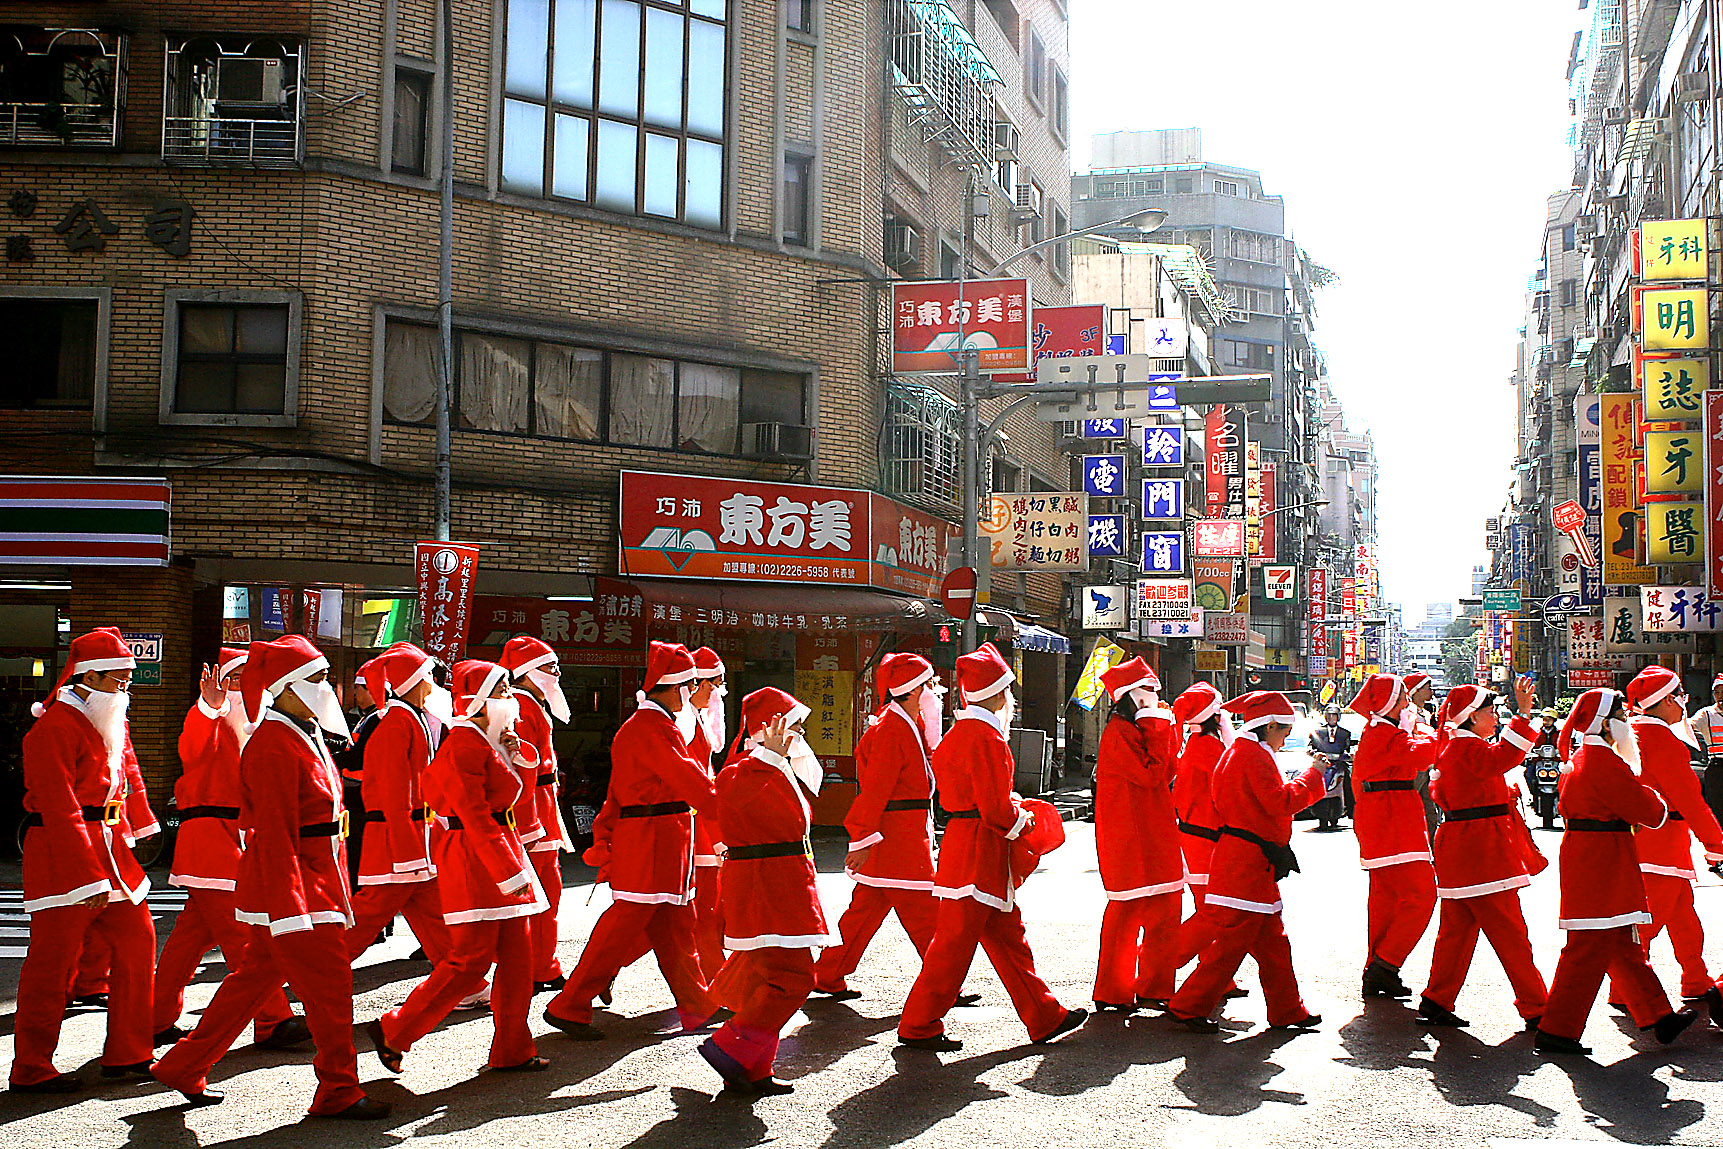 Church members who dress up as Santa Claus walk pass an old neighborhood in Hsimending, Taipei, December 24, 2006.